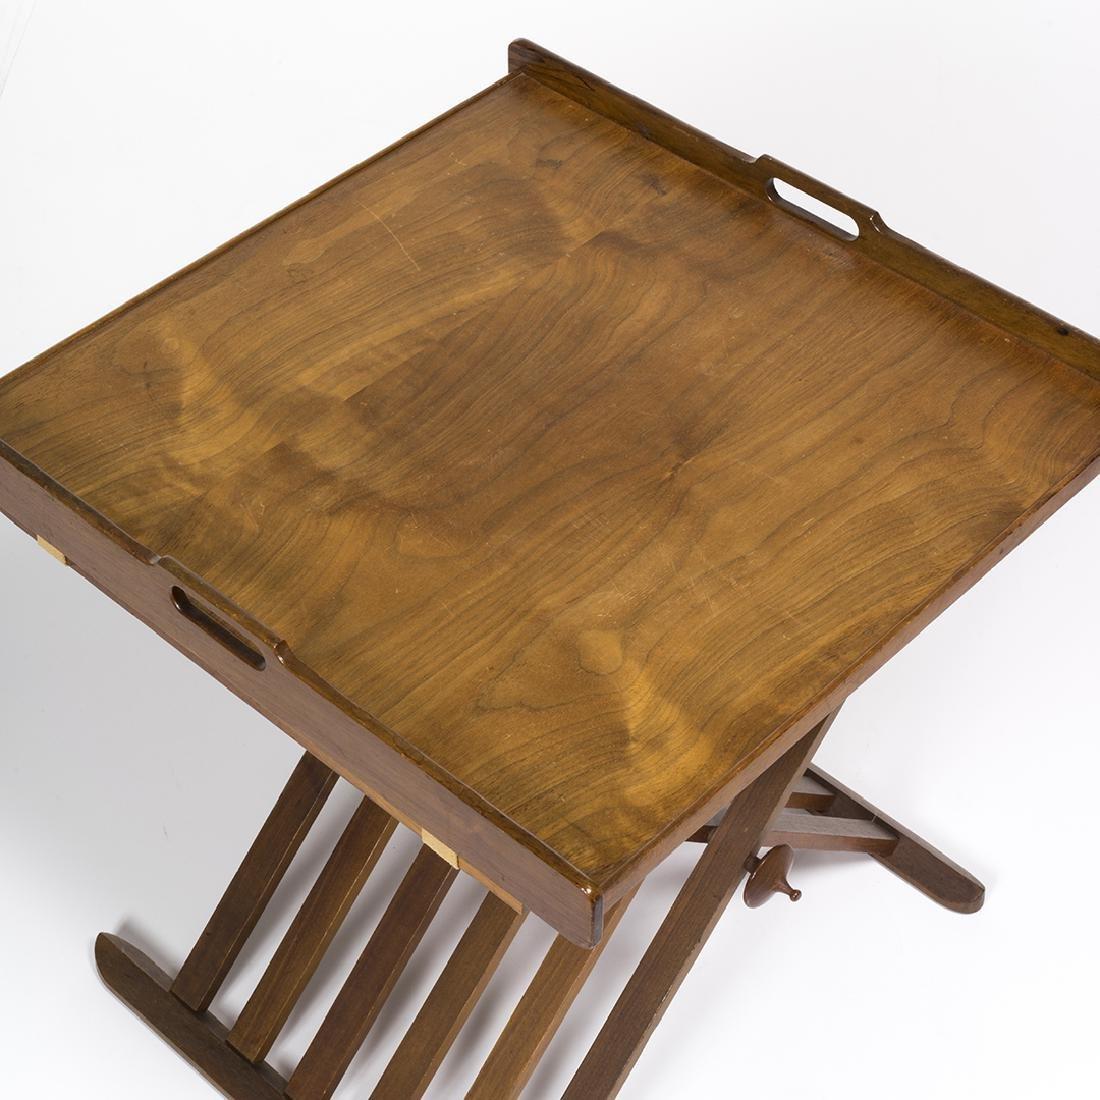 Kipp Stewart and Stewart MacDougall Tray Table - 3